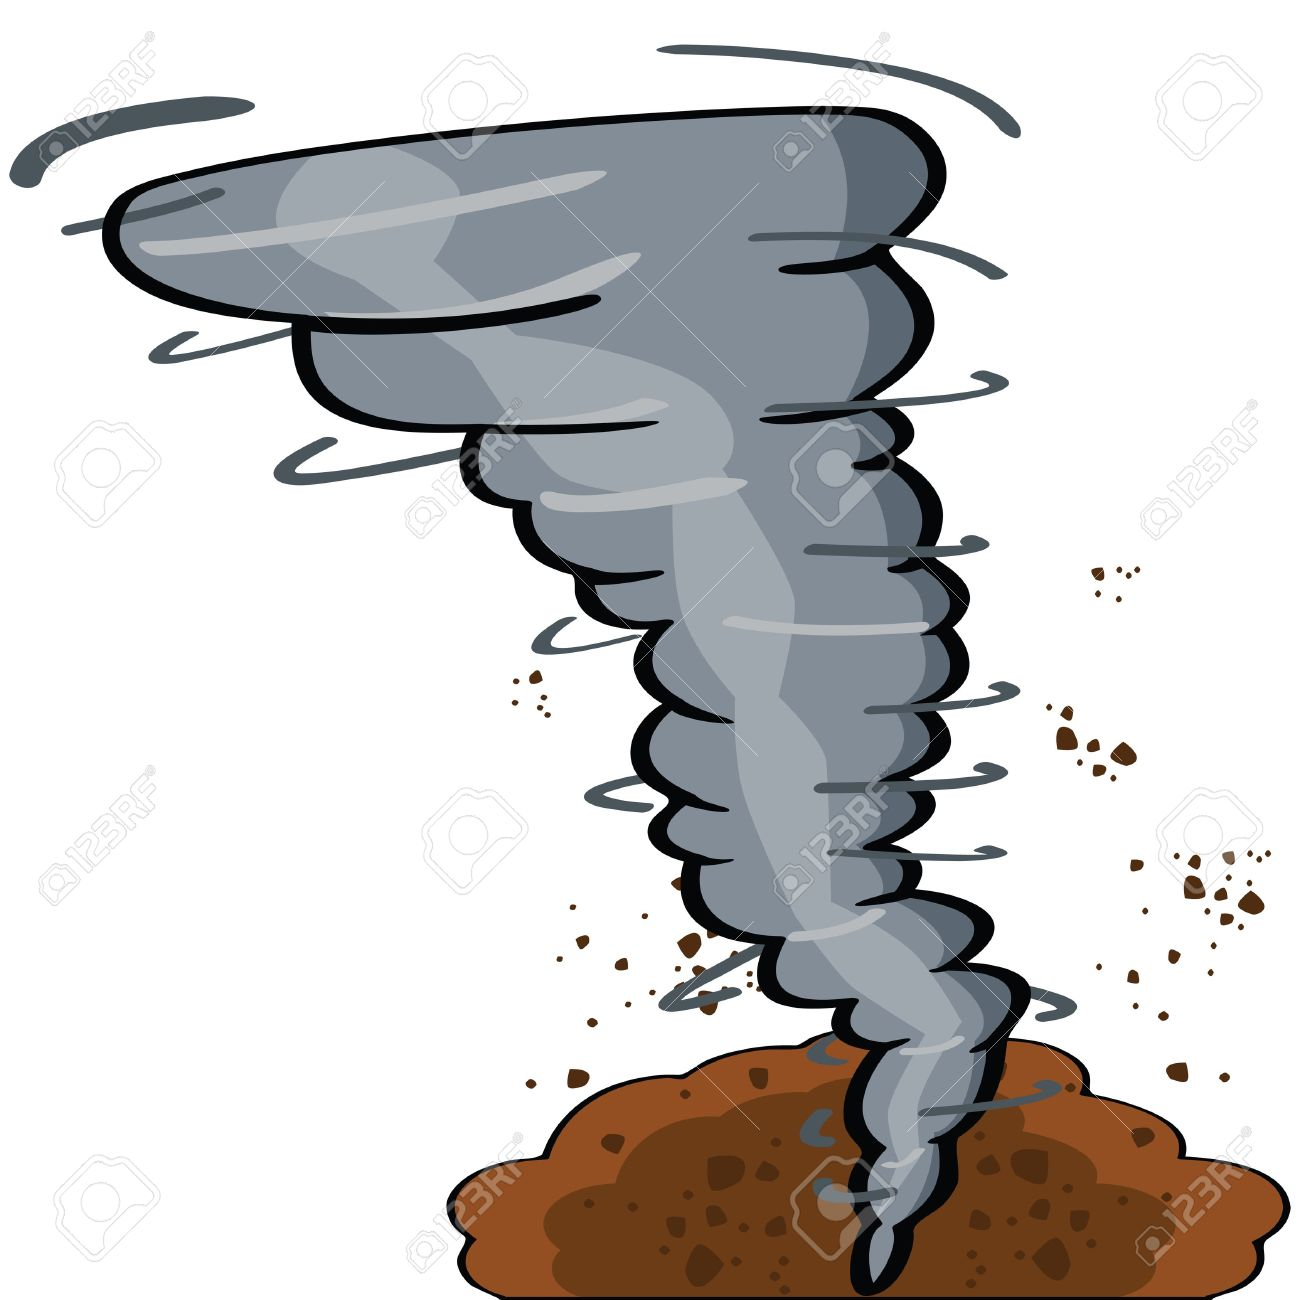 Cartoon Illustration Showing A Tornado Causing Destruction Royalty.